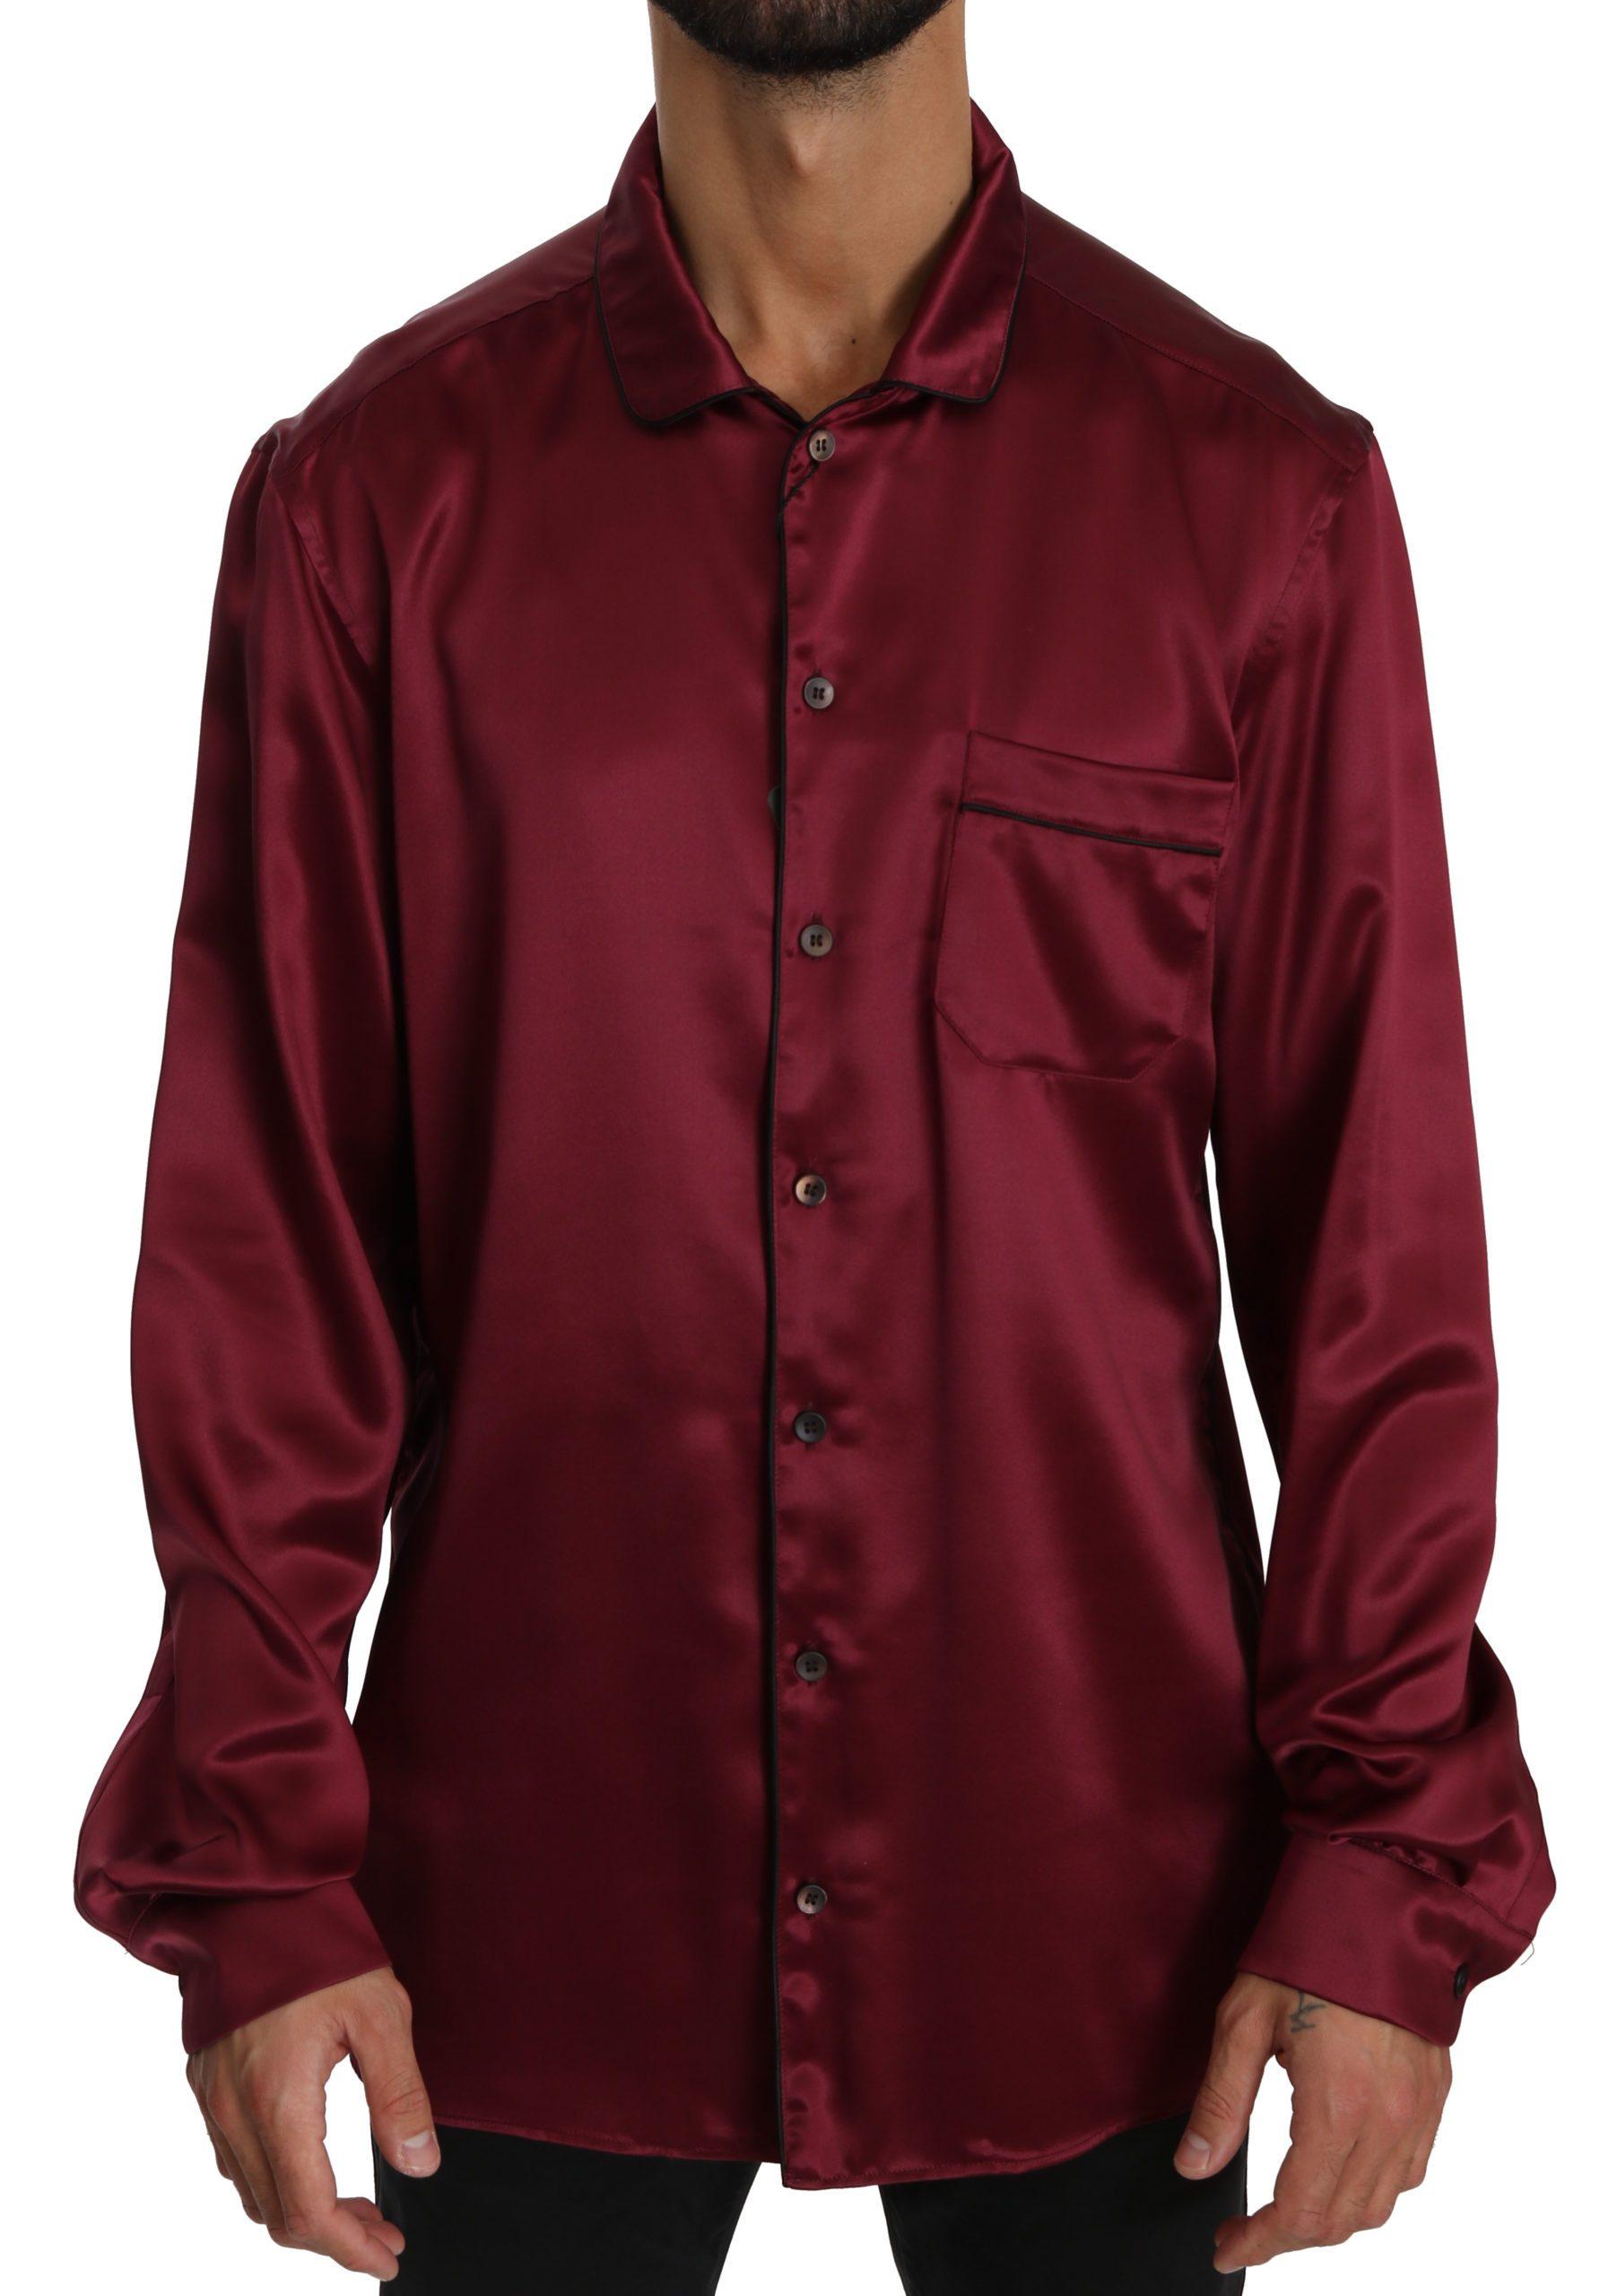 Dolce & Gabbana Men's Pajama Silk Shirt Bordeaux TSH4022 - IT40 | M